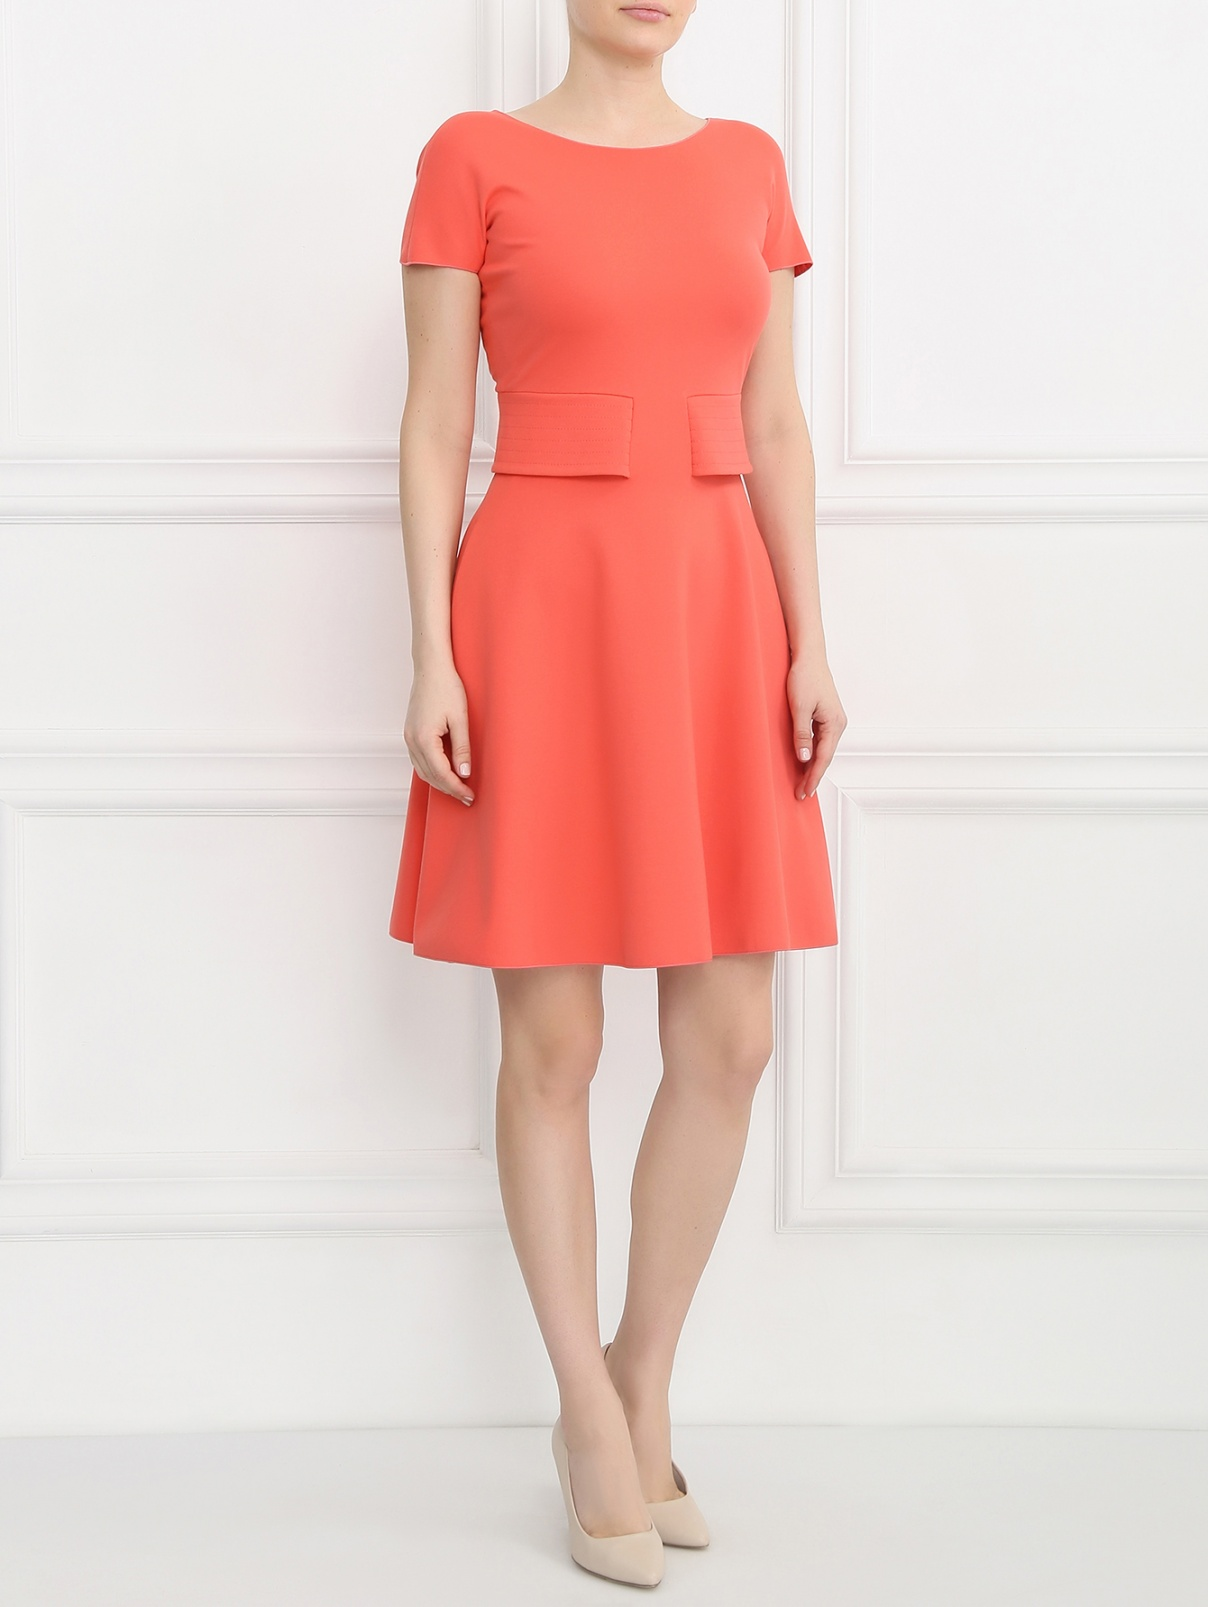 Платье-мини с короткими рукавами Armani Collezioni  –  Модель Общий вид